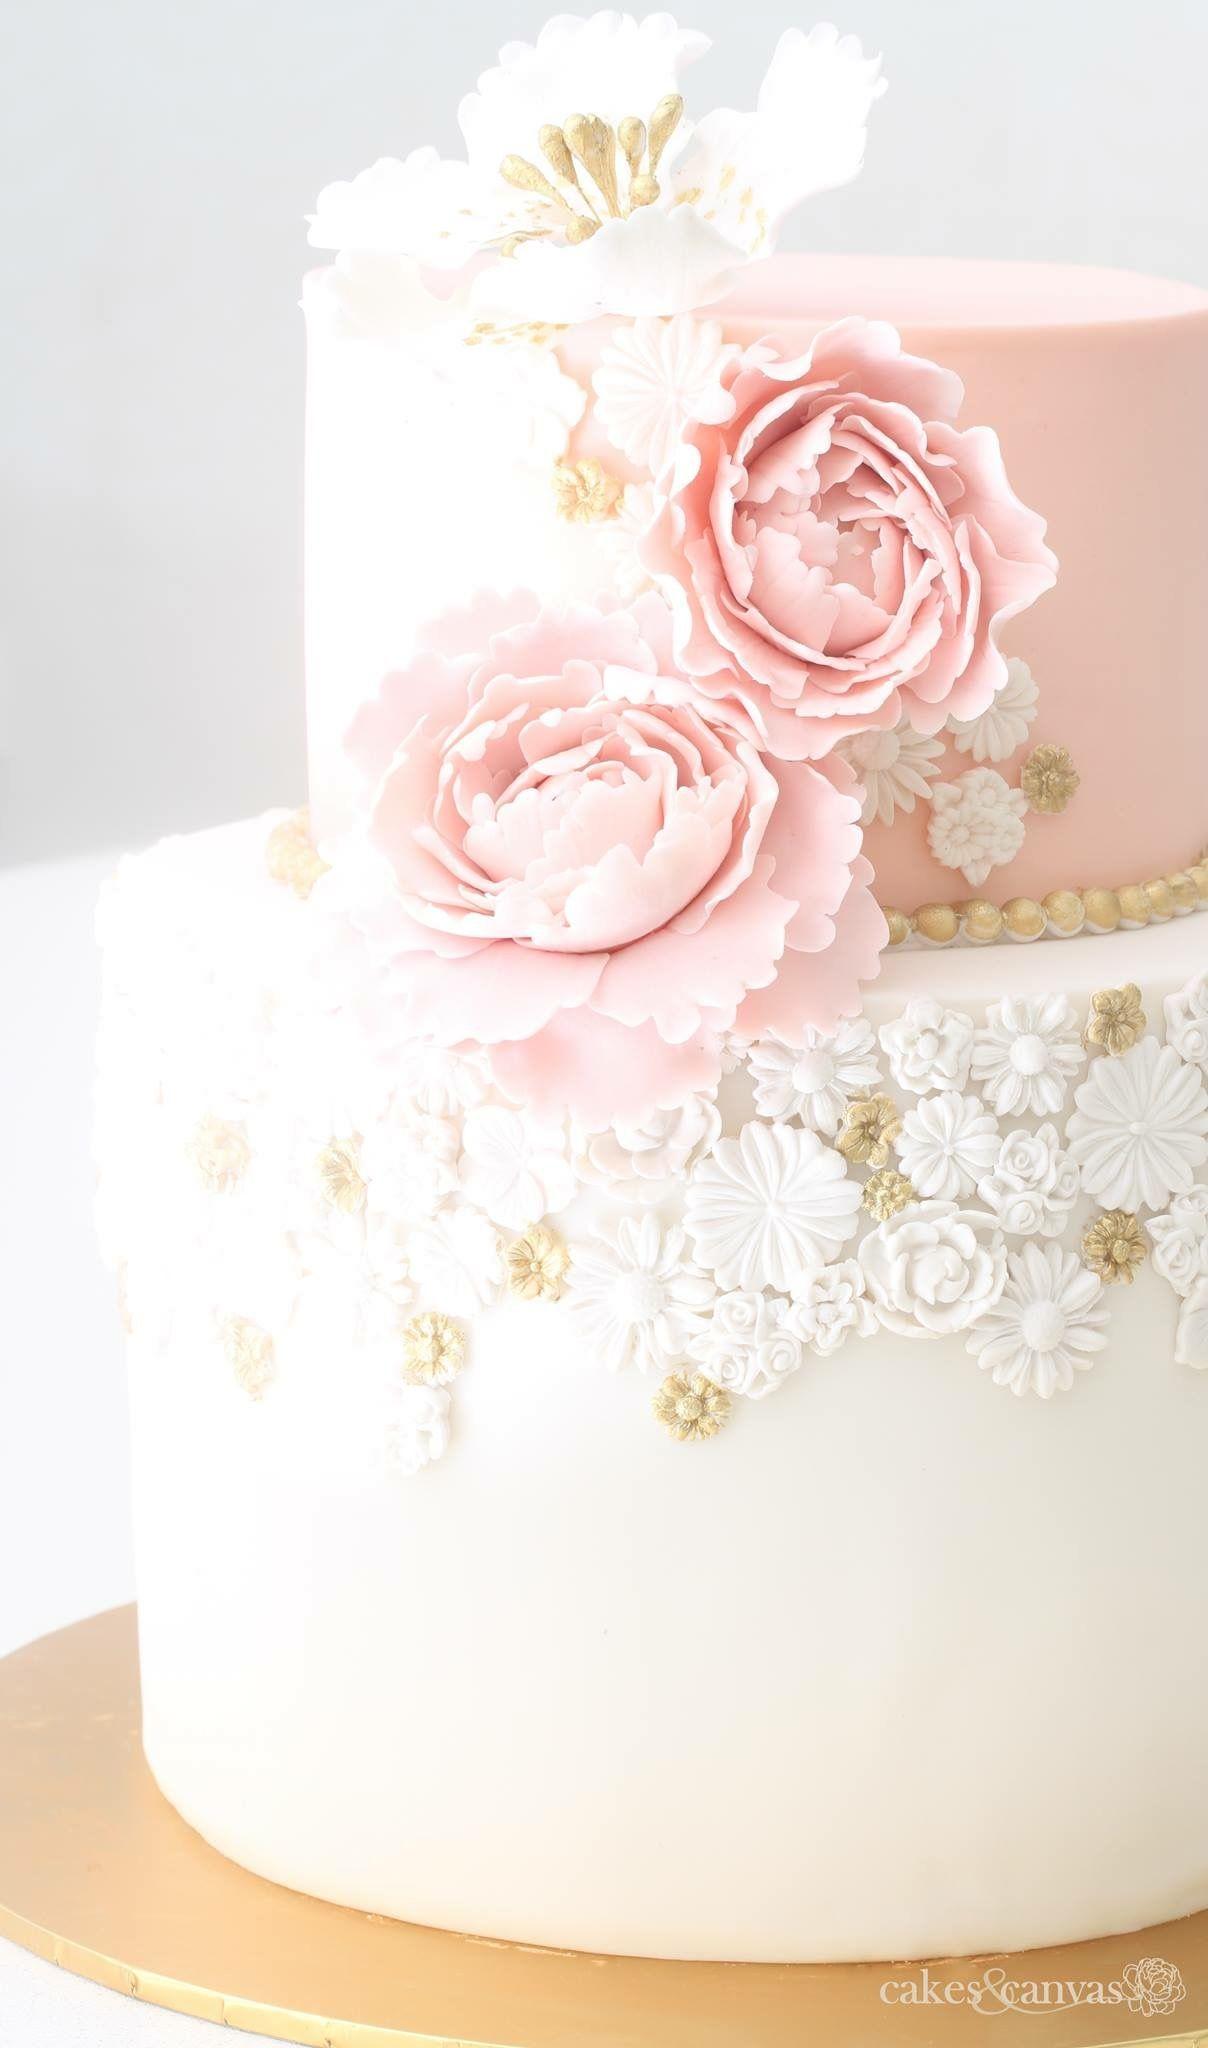 Pin by melanie carman on cakes pinterest cake wedding cake and